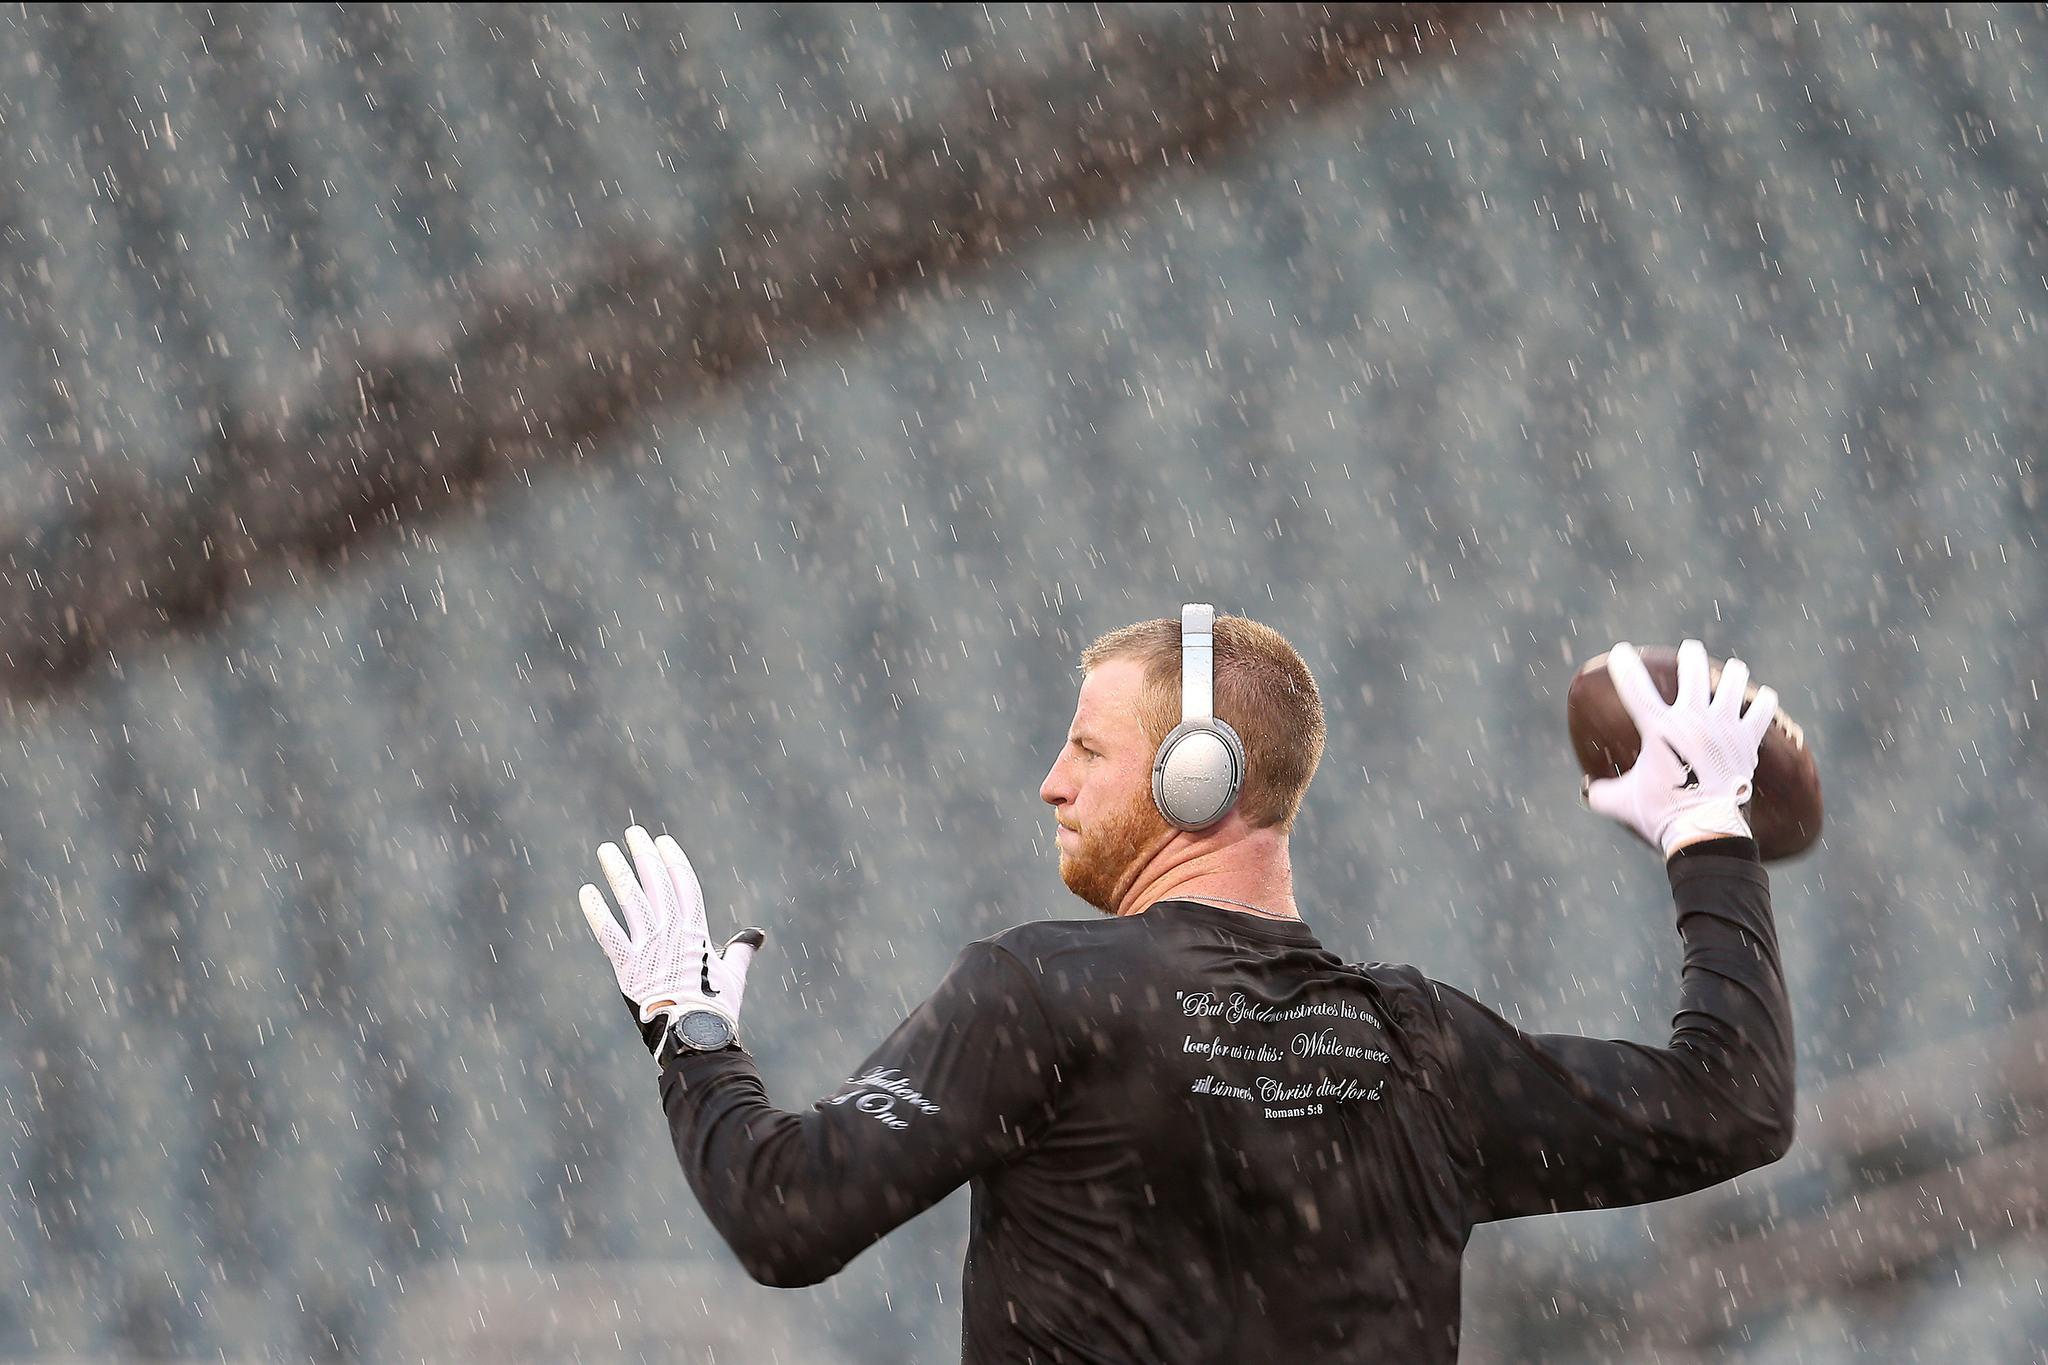 Eagle quarterback Carson Wentz.